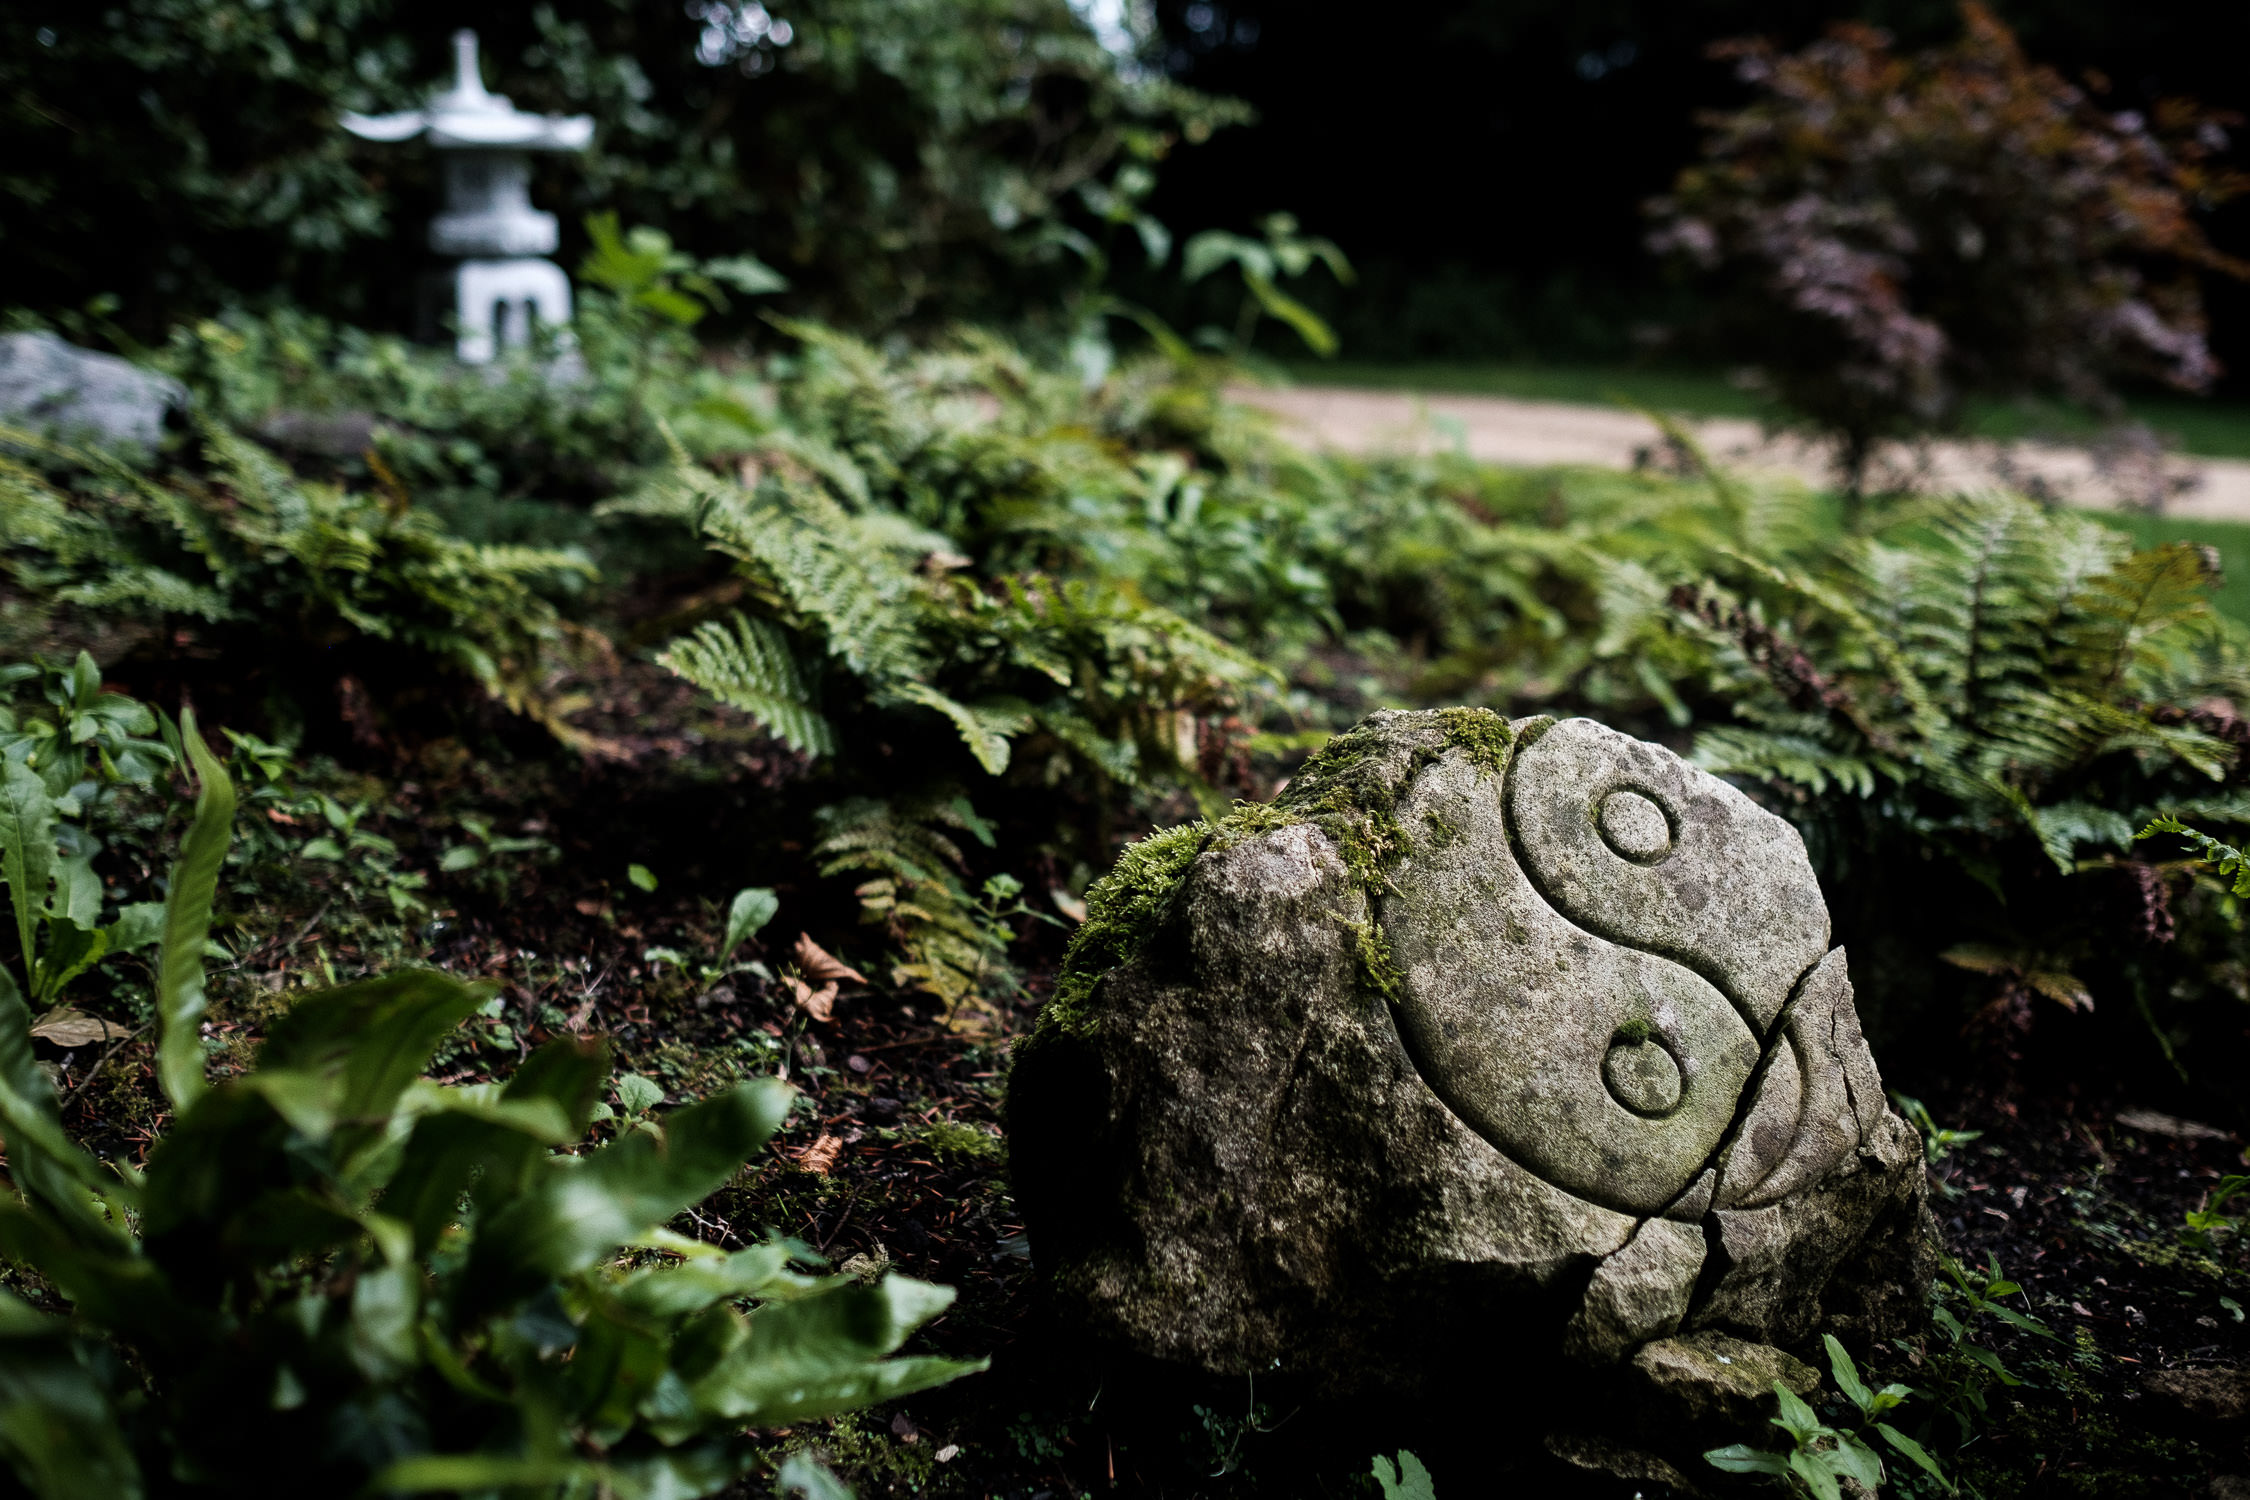 rock with yin yang symbol